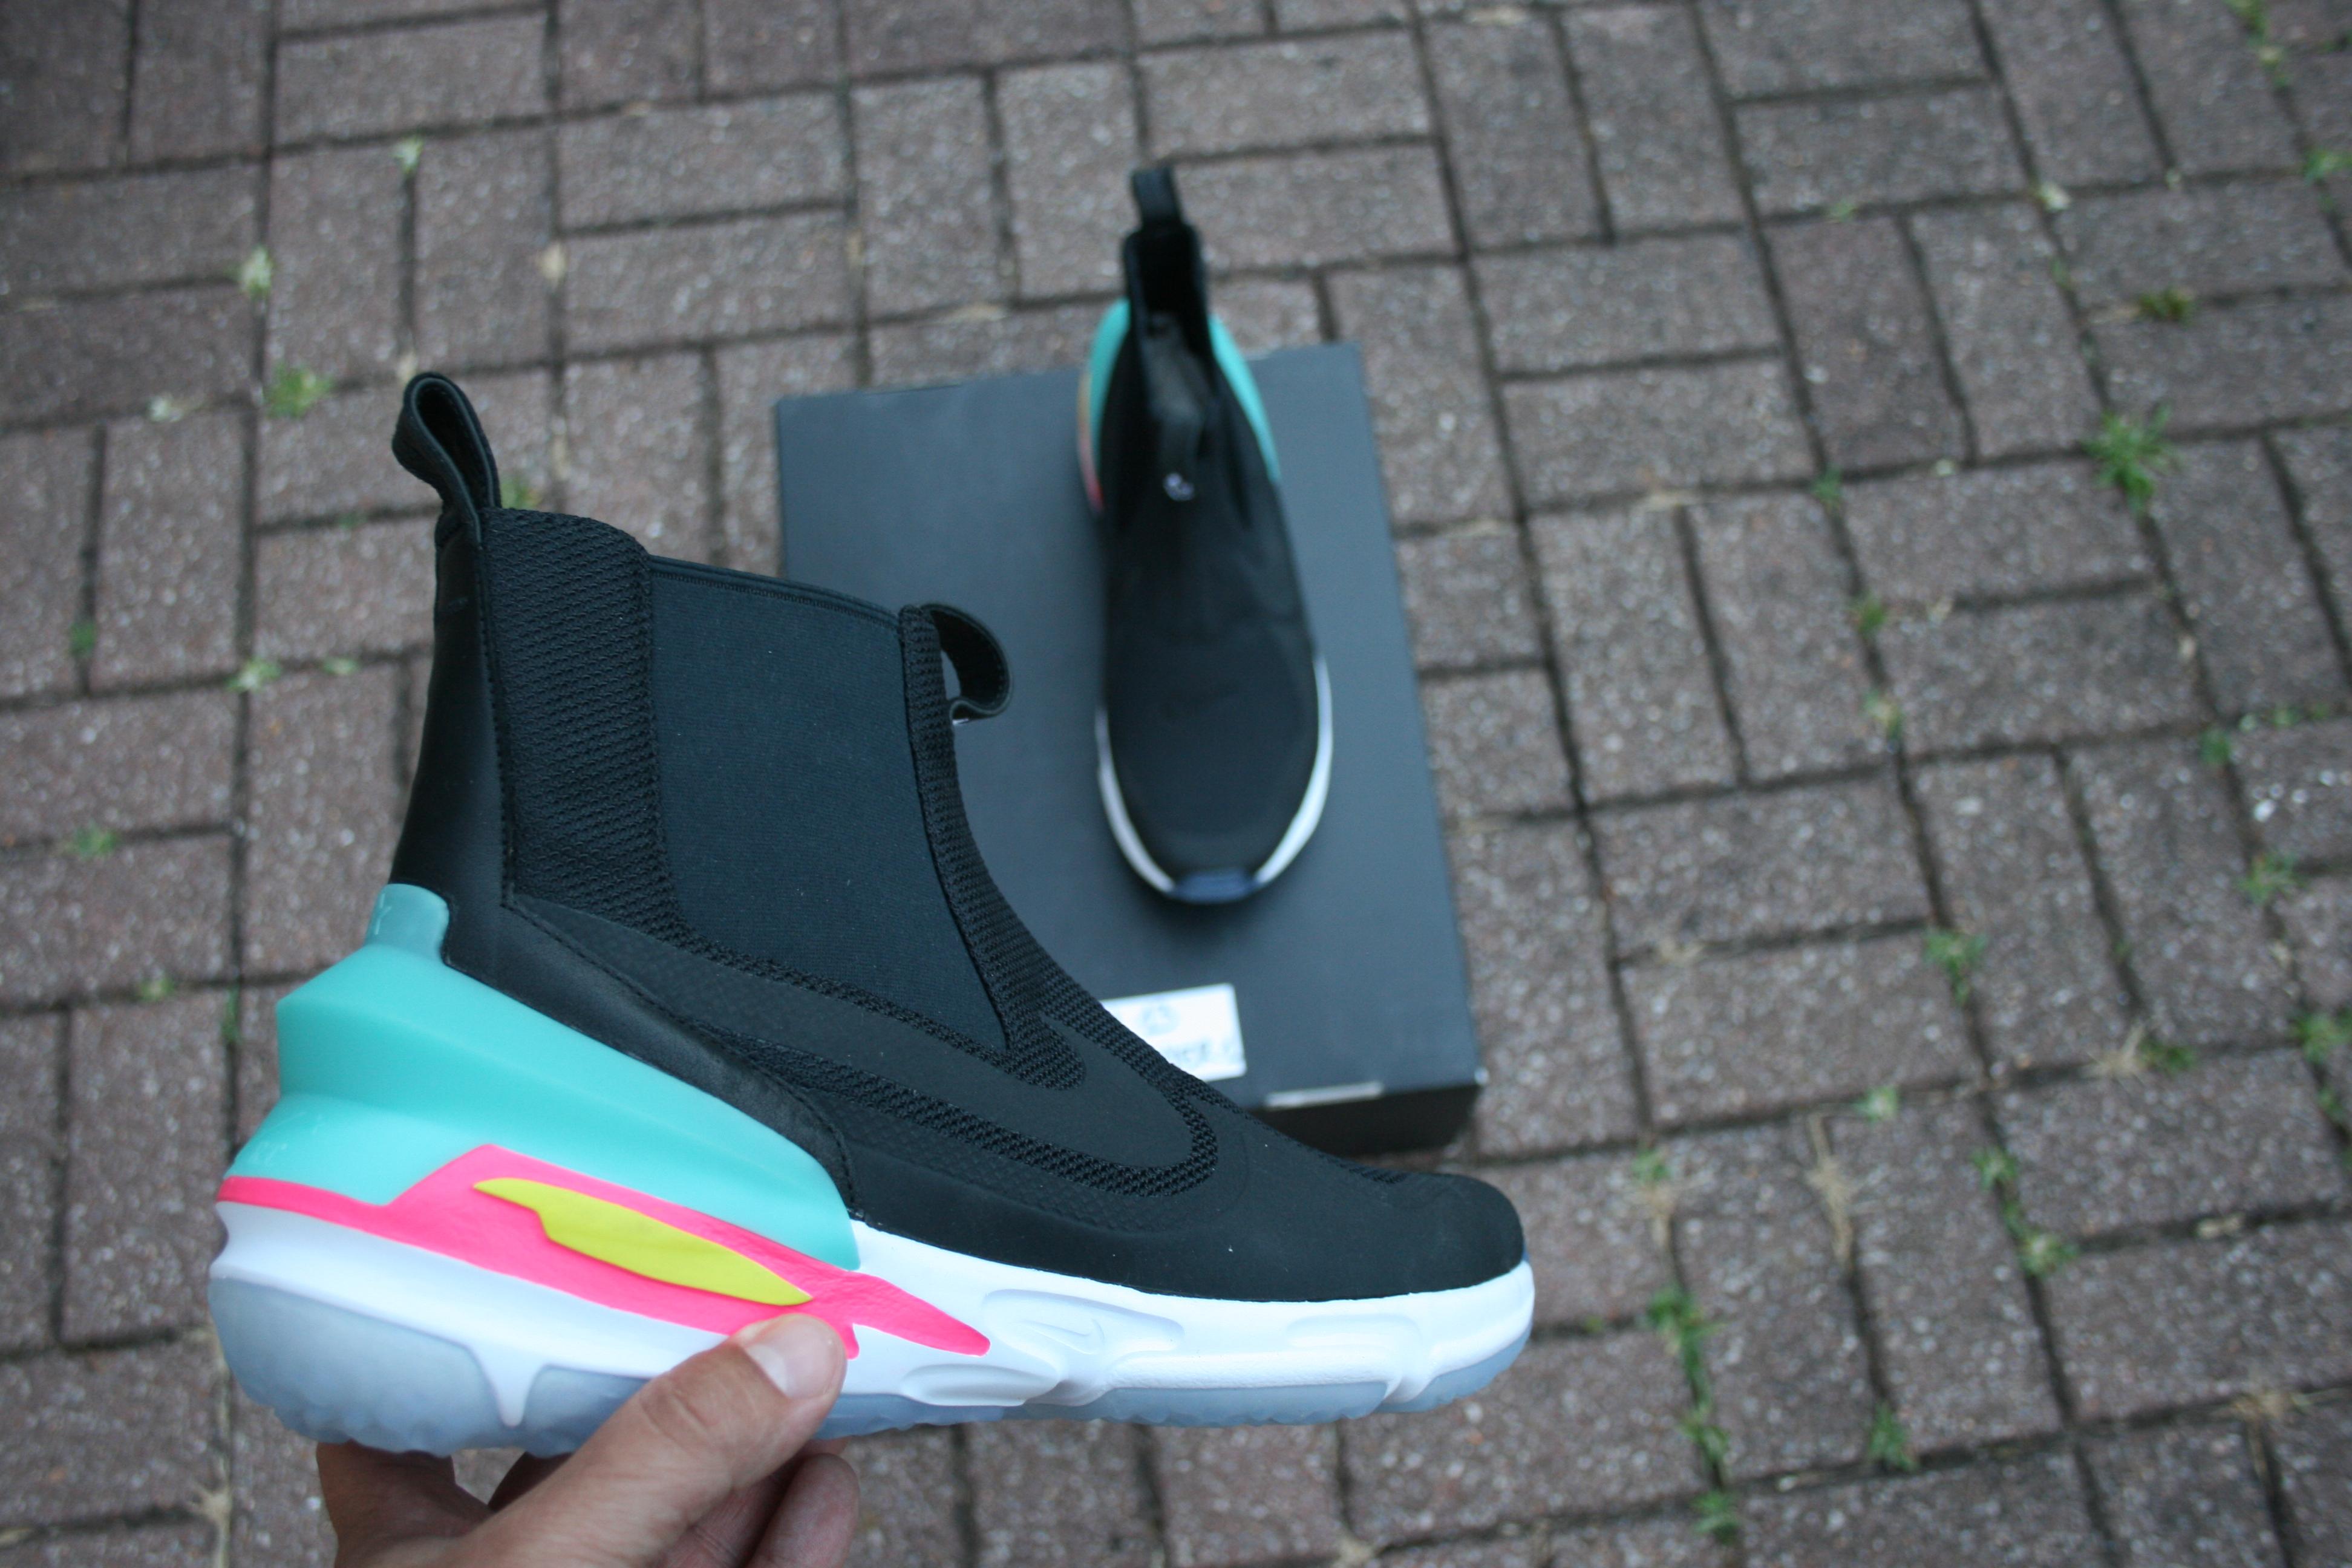 2a0d46cffadb6 Nike Nike Air Zoom Legend   RT Riccardo Tisci DS sz.13US Lab Dunk ...